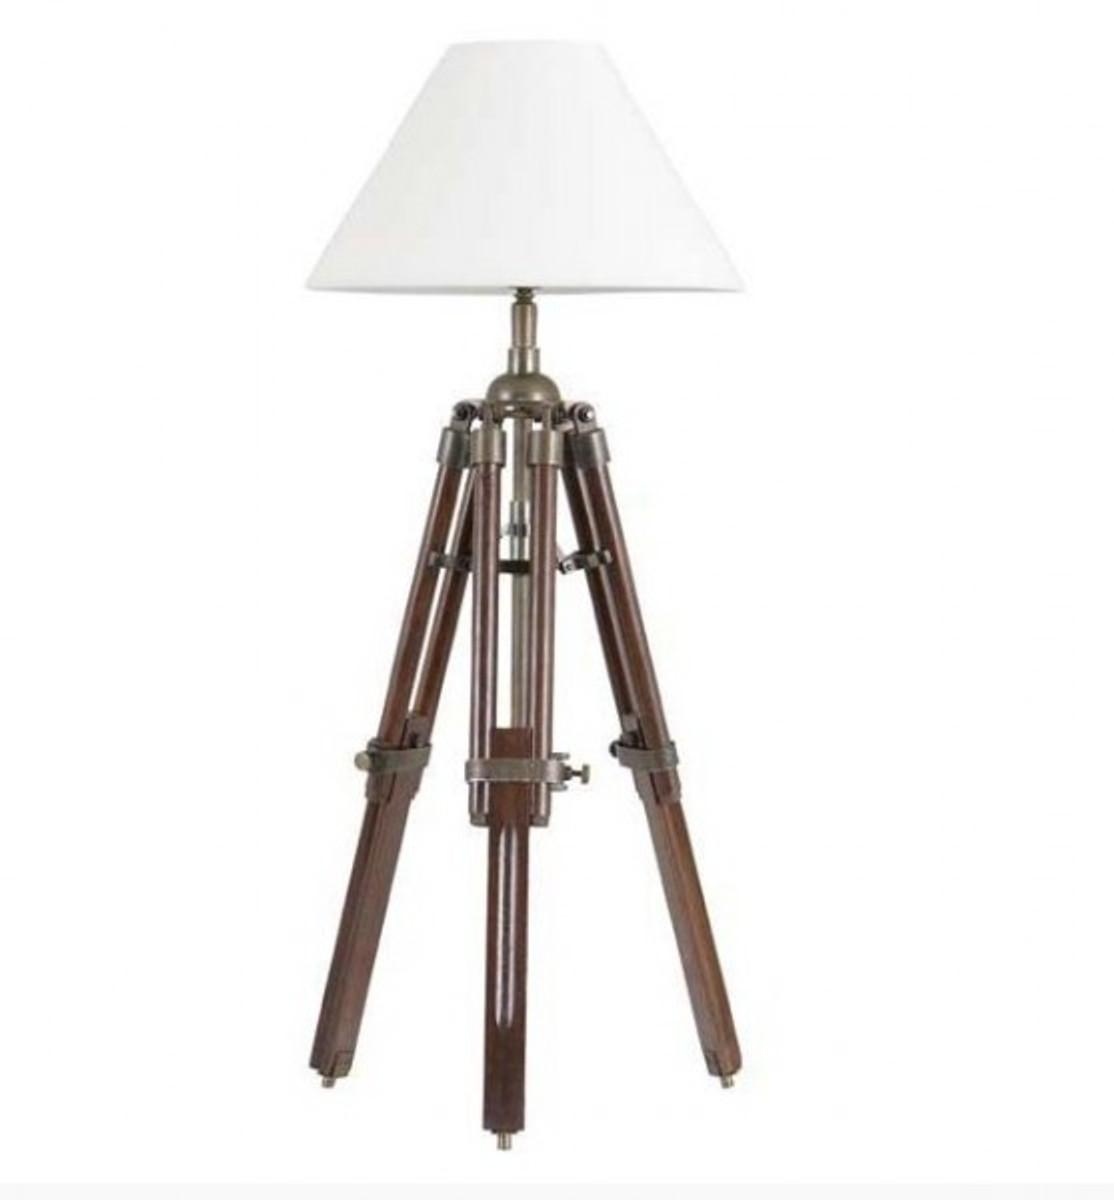 designer stativ lampe telescope hockerleuchte mit weissem schirm h 60 cm tripod lamp. Black Bedroom Furniture Sets. Home Design Ideas